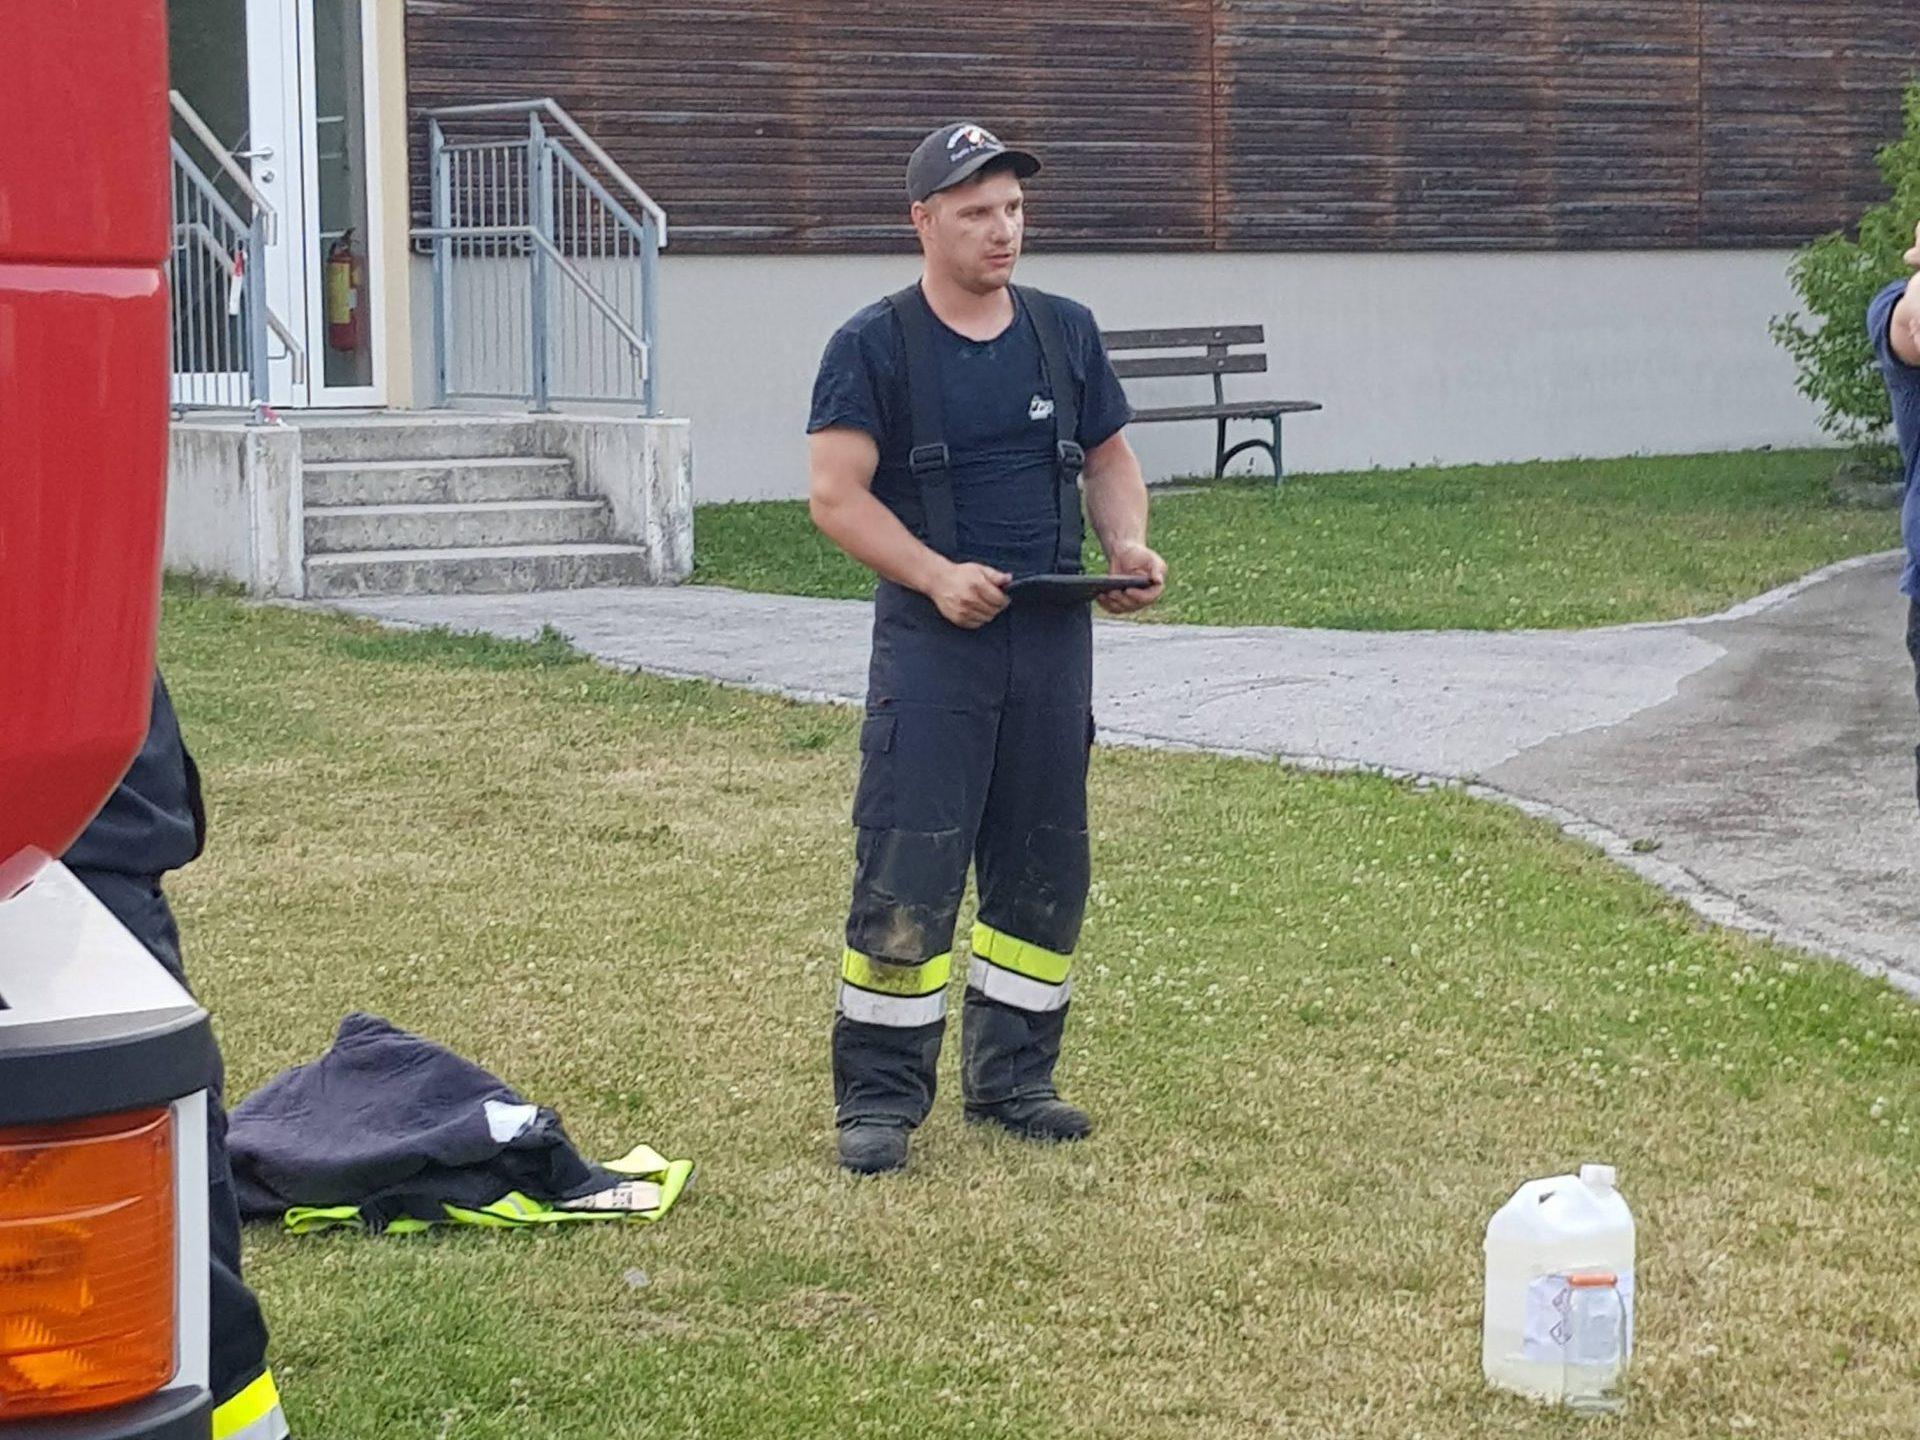 Übung: Giftgas Austritt